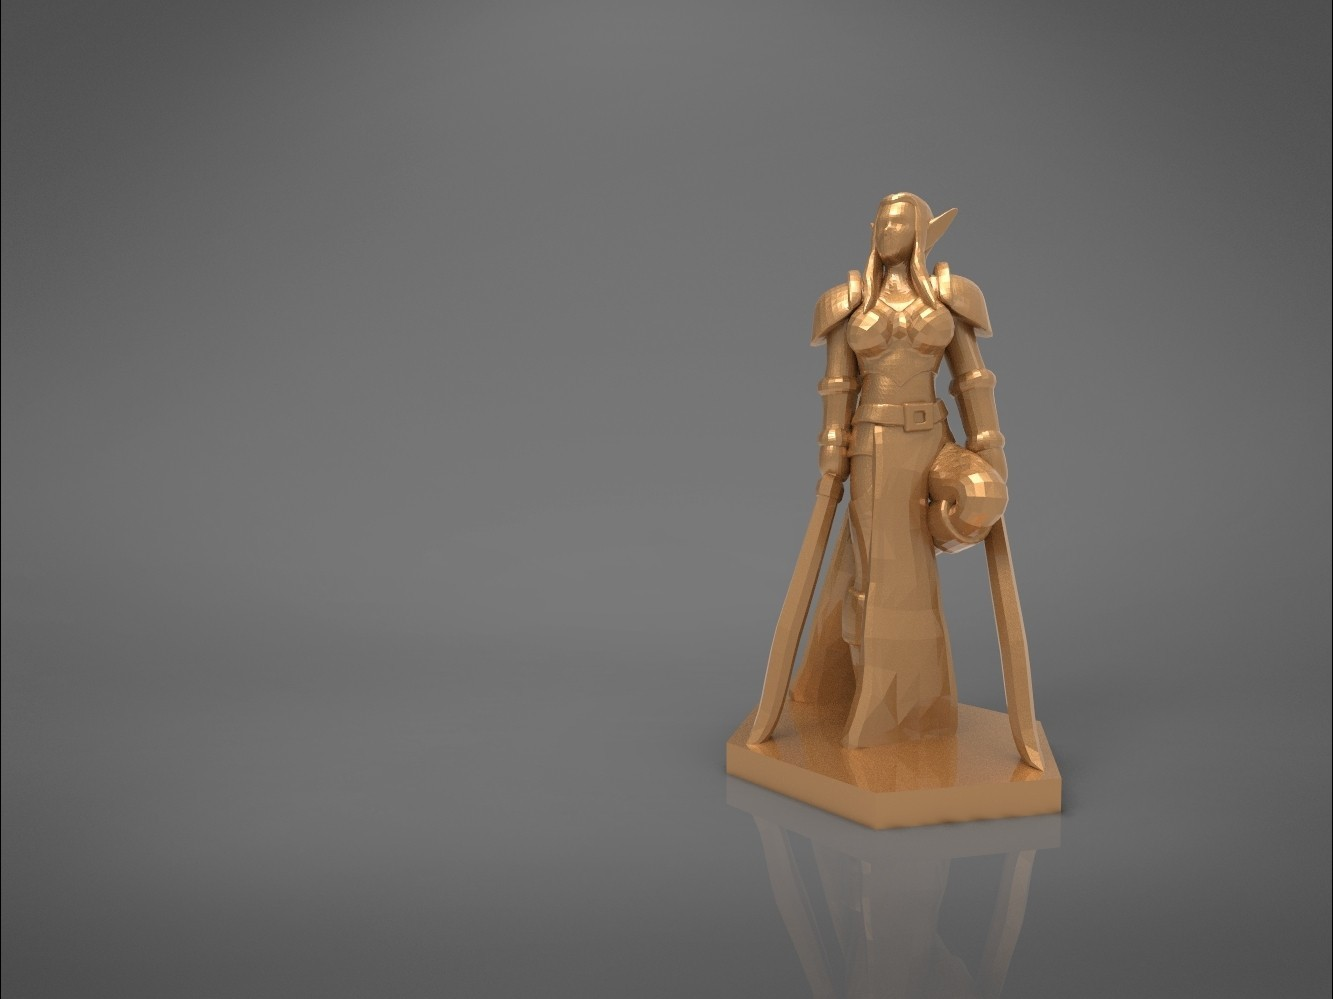 Warrior_2-main_render.325.jpg Download STL file ELF WARRIOR FEMALE CHARACTER GAME FIGURE 3D print model • 3D printing object, 3D-mon